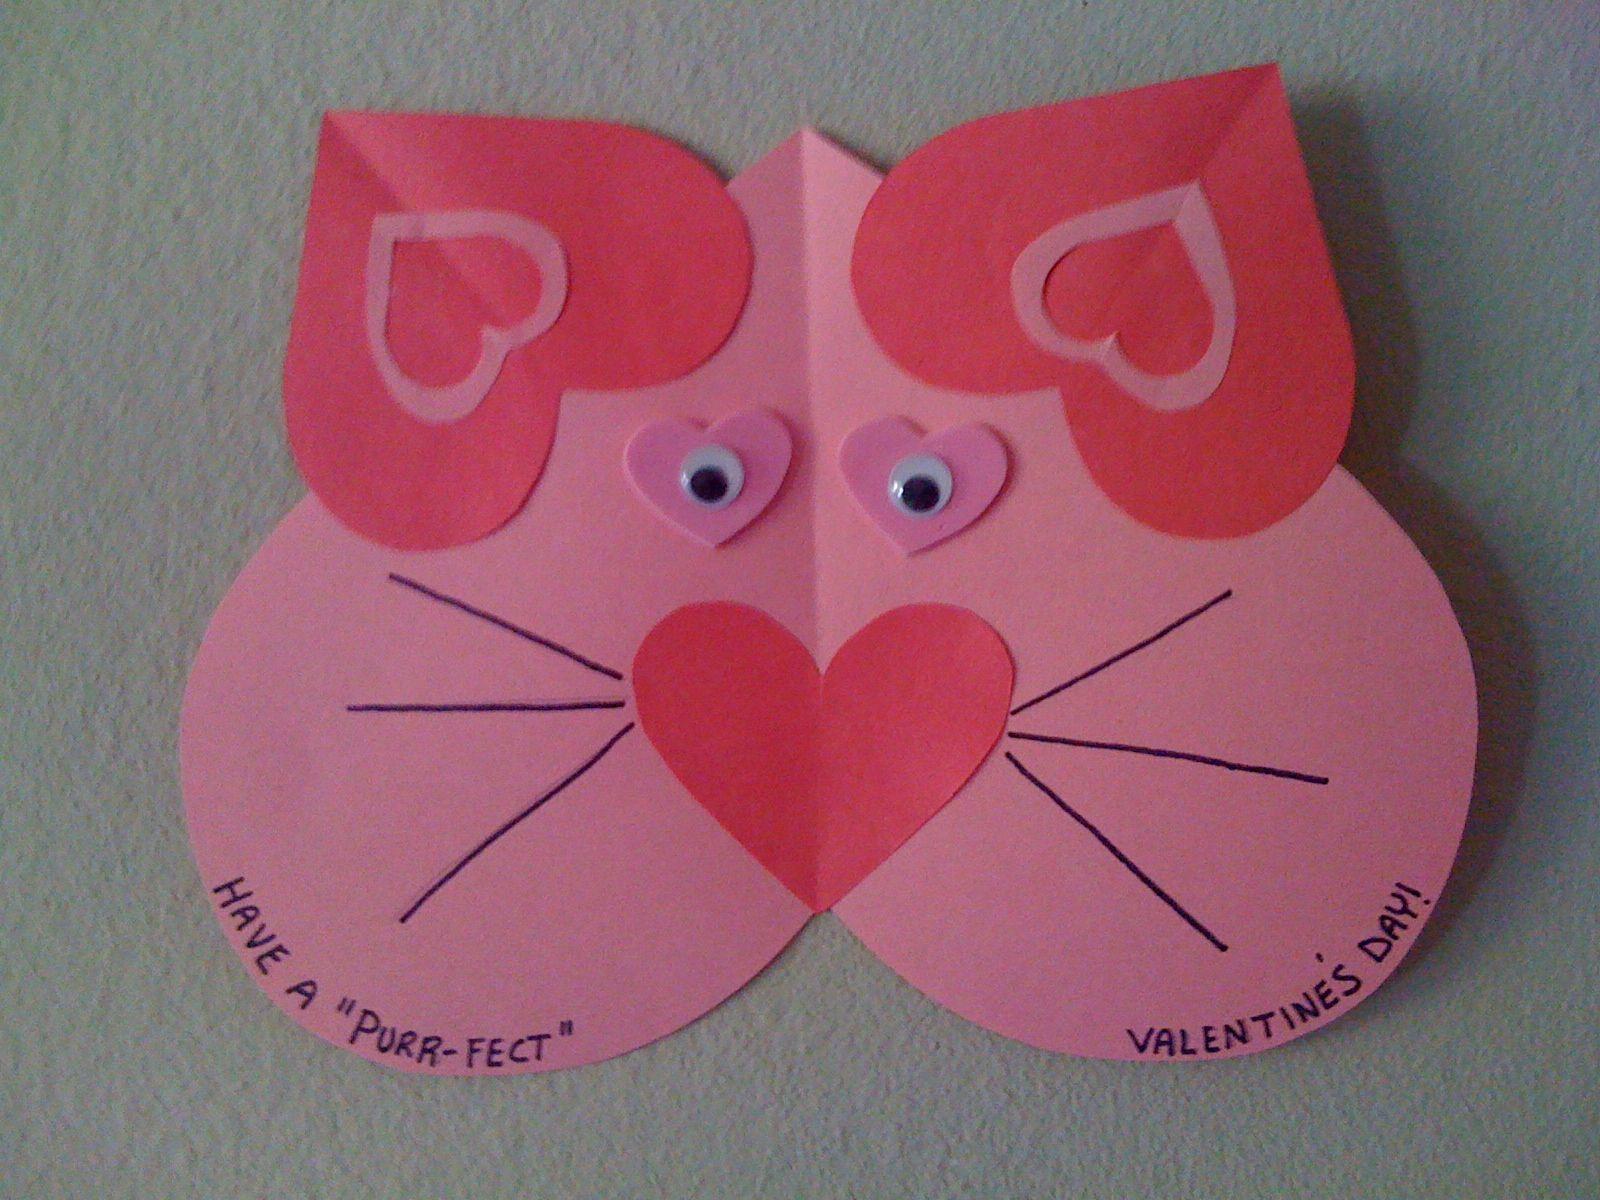 Heart Craft Ideas For Preschoolers  Valentine s craft for kids easy craft for preschooler